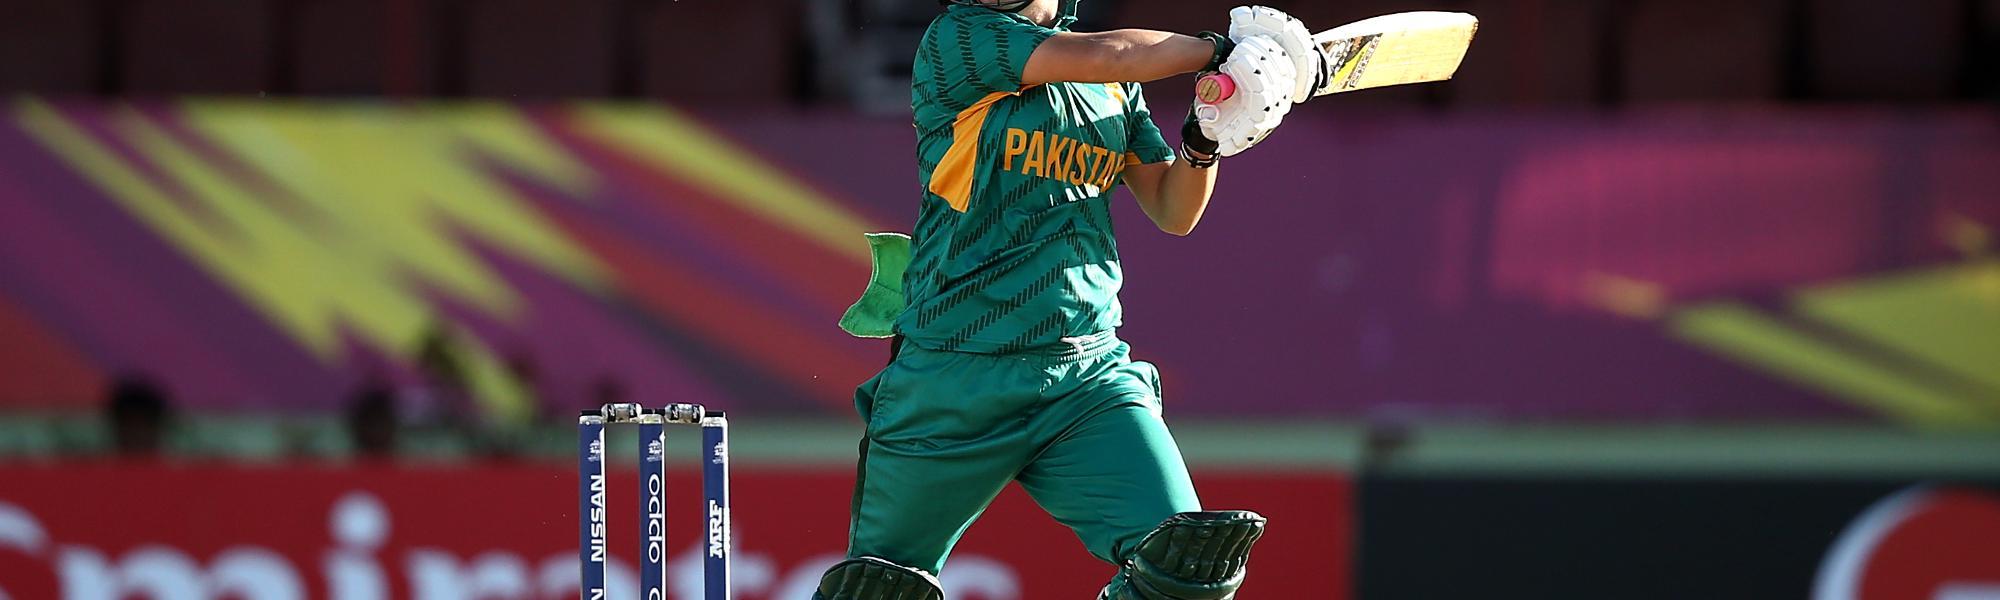 Nahida Khan of Pakistan bats during the ICC Women's World T20 2018 match between Pakistan and Ireland at Guyana National Stadium on November 13, 2018 in Providence, Guyana.